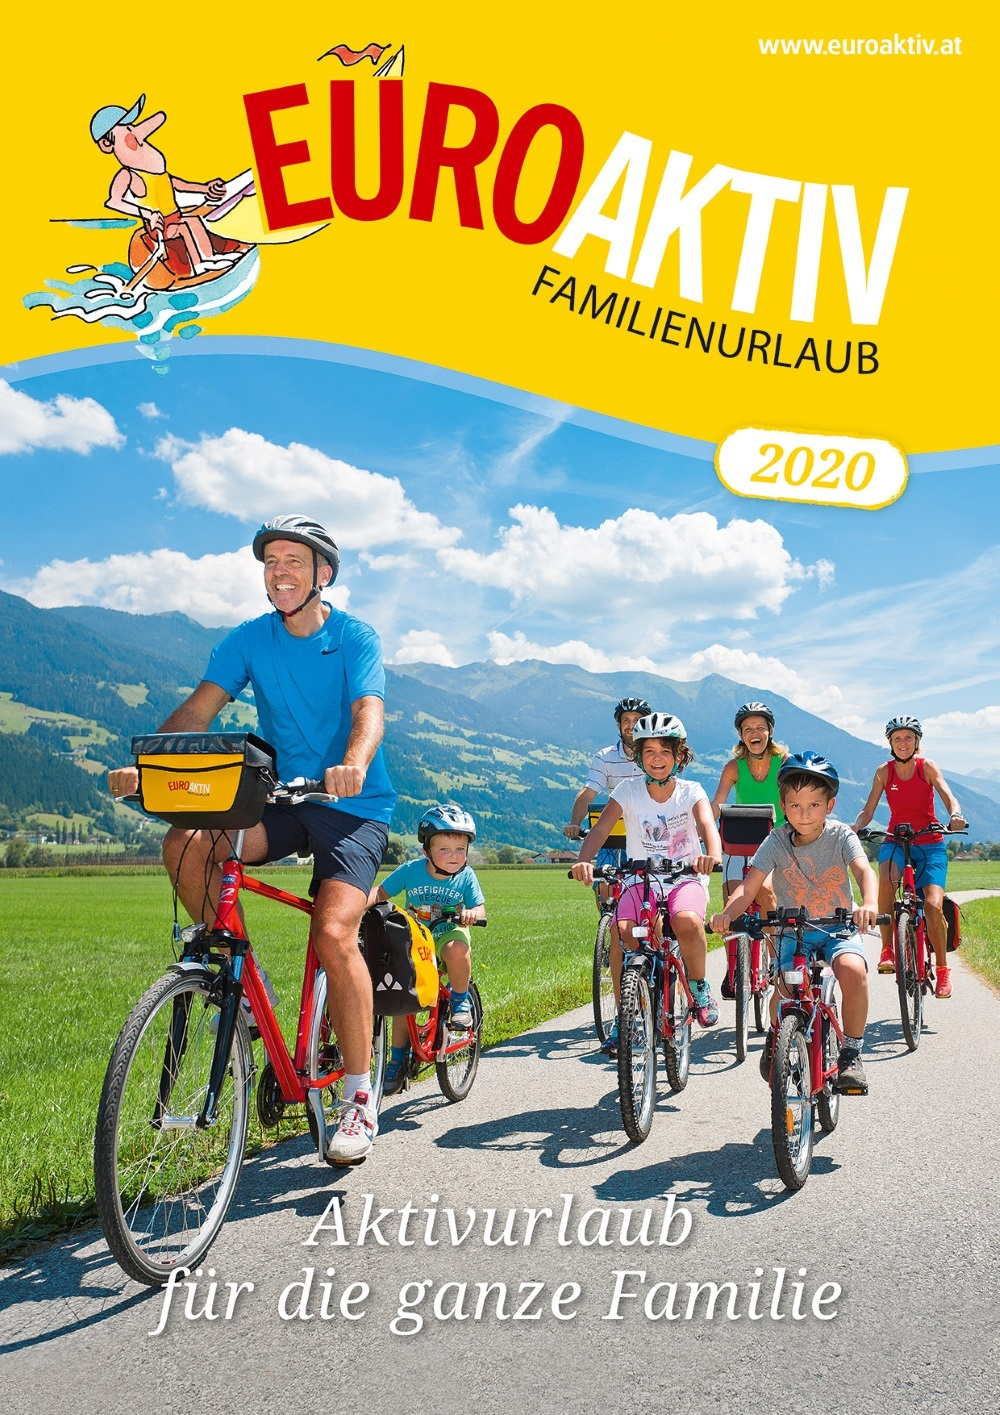 Euroaktiv Katalog 2020